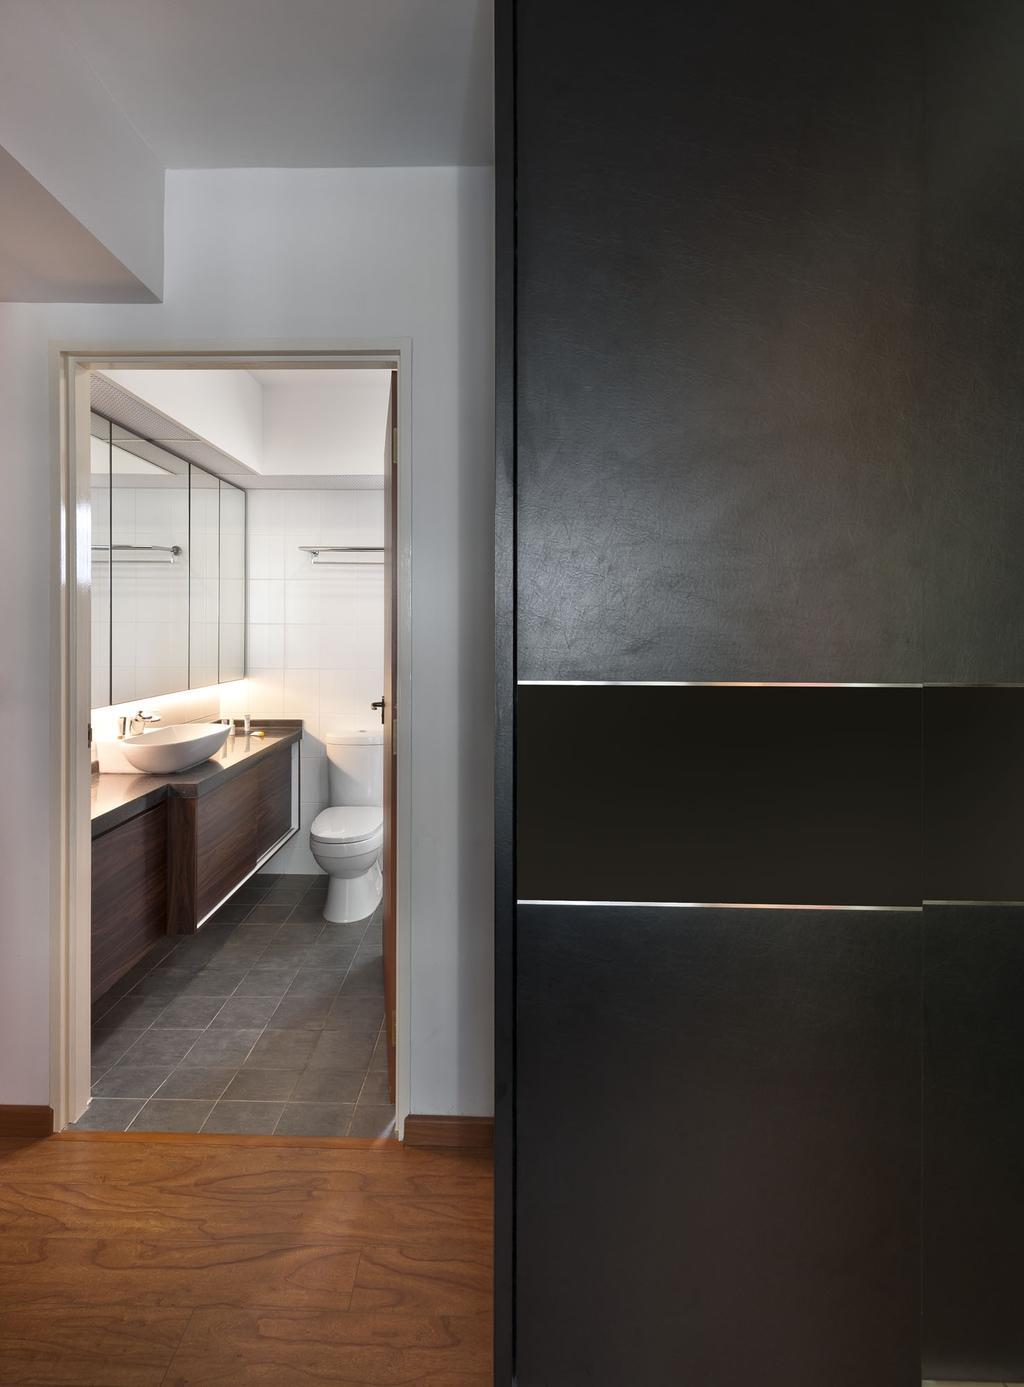 Transitional, HDB, Bathroom, Punggol Drive, Interior Designer, D5 Studio Image, Tiles, Wood Flooring, Vanity, Simple, Plain, Toilet, Indoors, Interior Design, Room